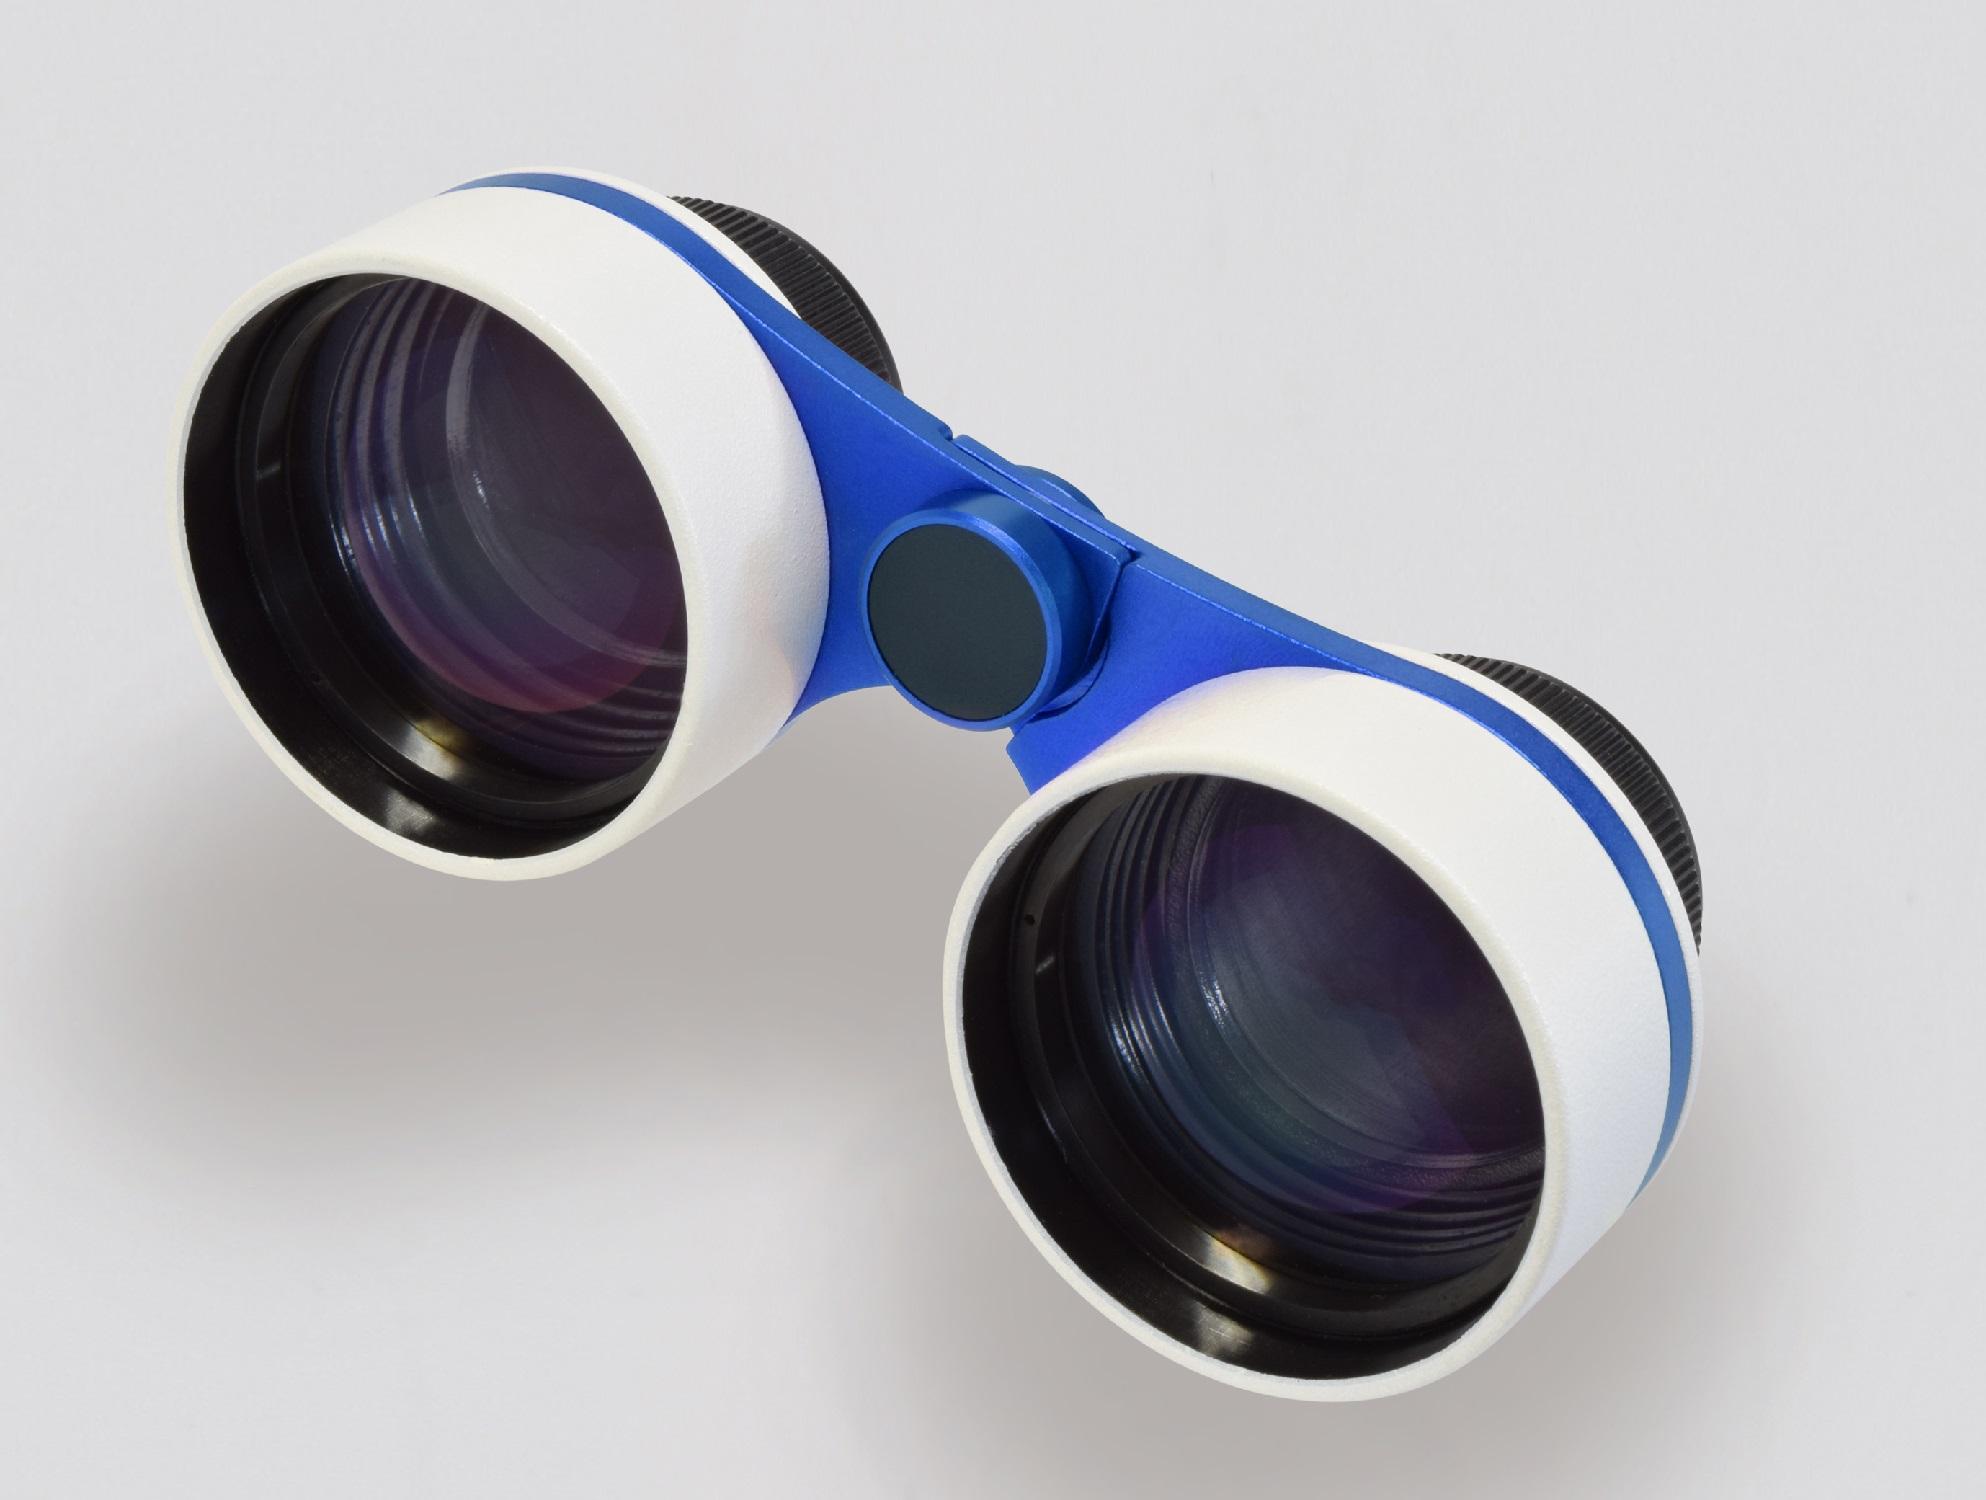 SIGHTRON 星空観測双眼鏡 Stella Scan2x40